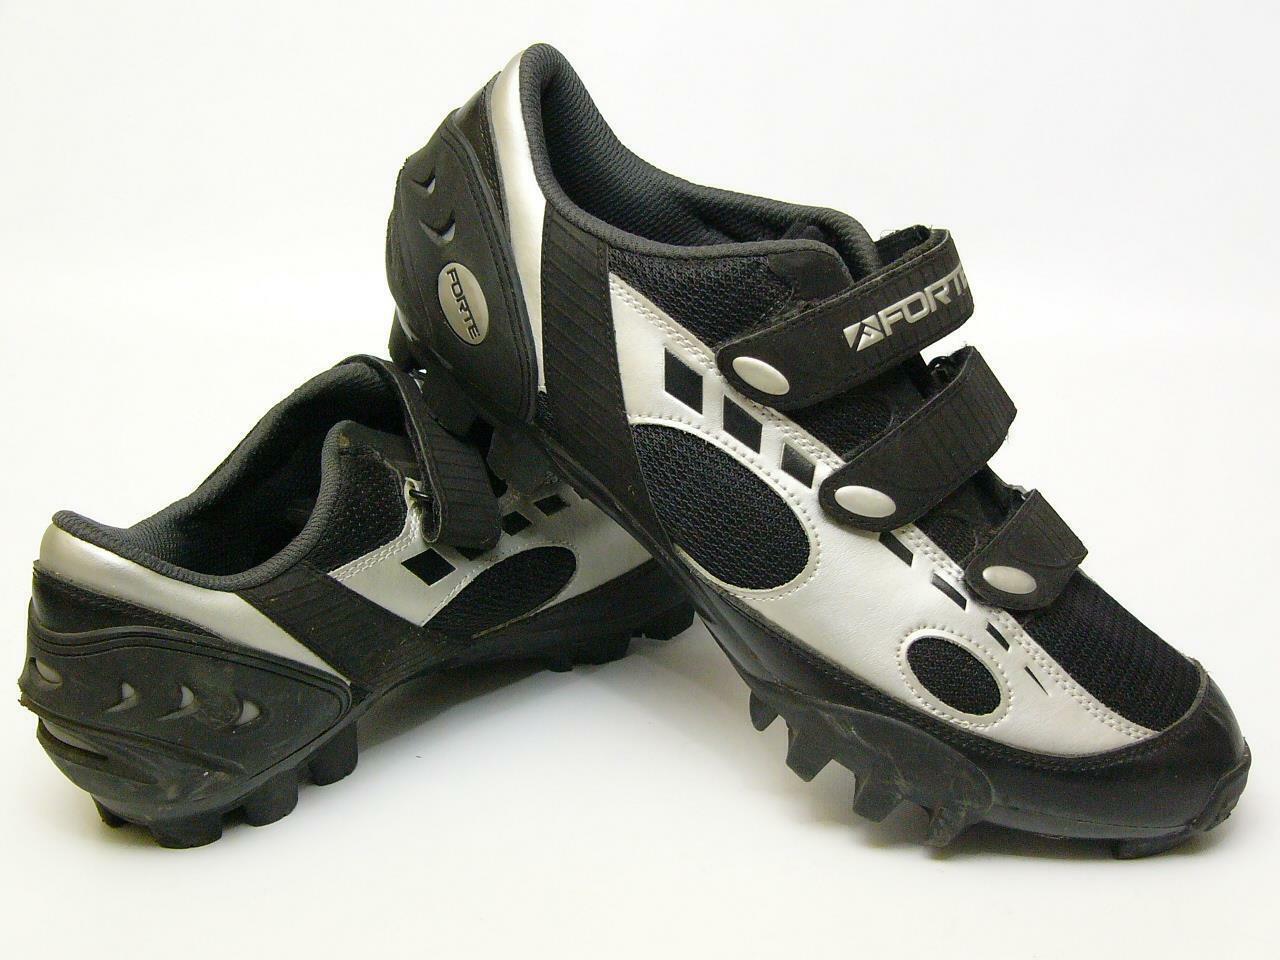 FORTE CM310 Mountain  Bike Cycling shoes w  SPD Cleats Men's US 13.5  online fashion shopping